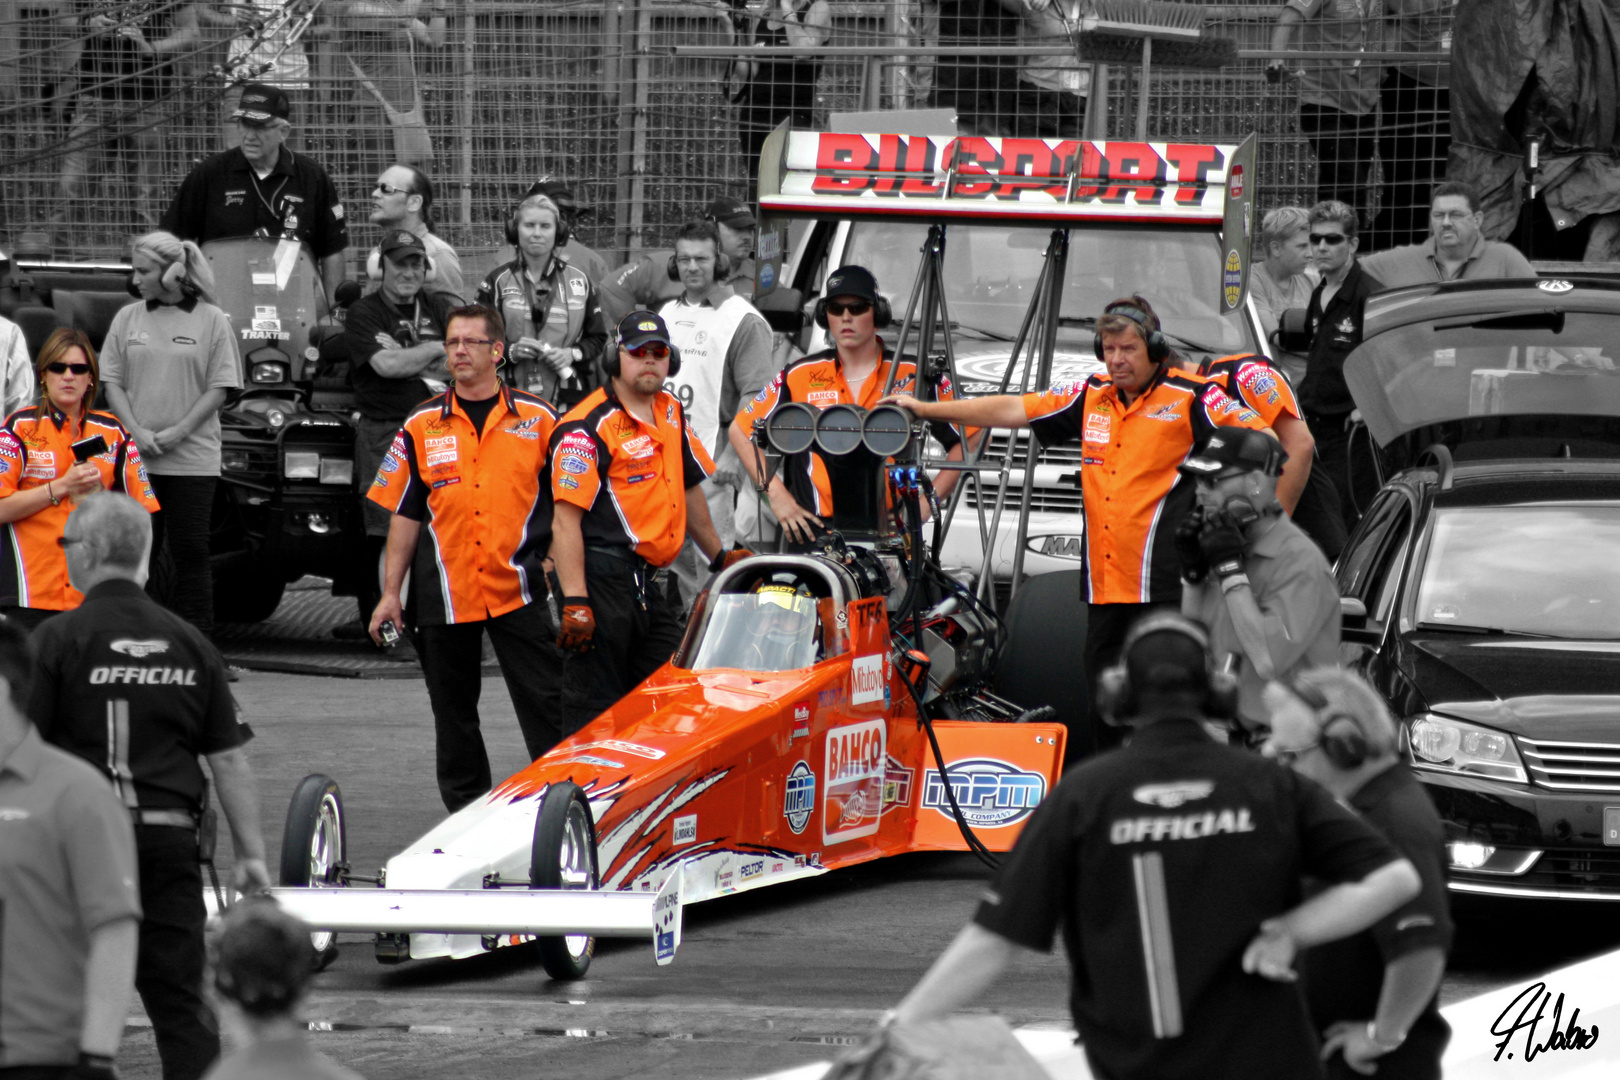 Top-Fuel - Racing Team Micke Kagered